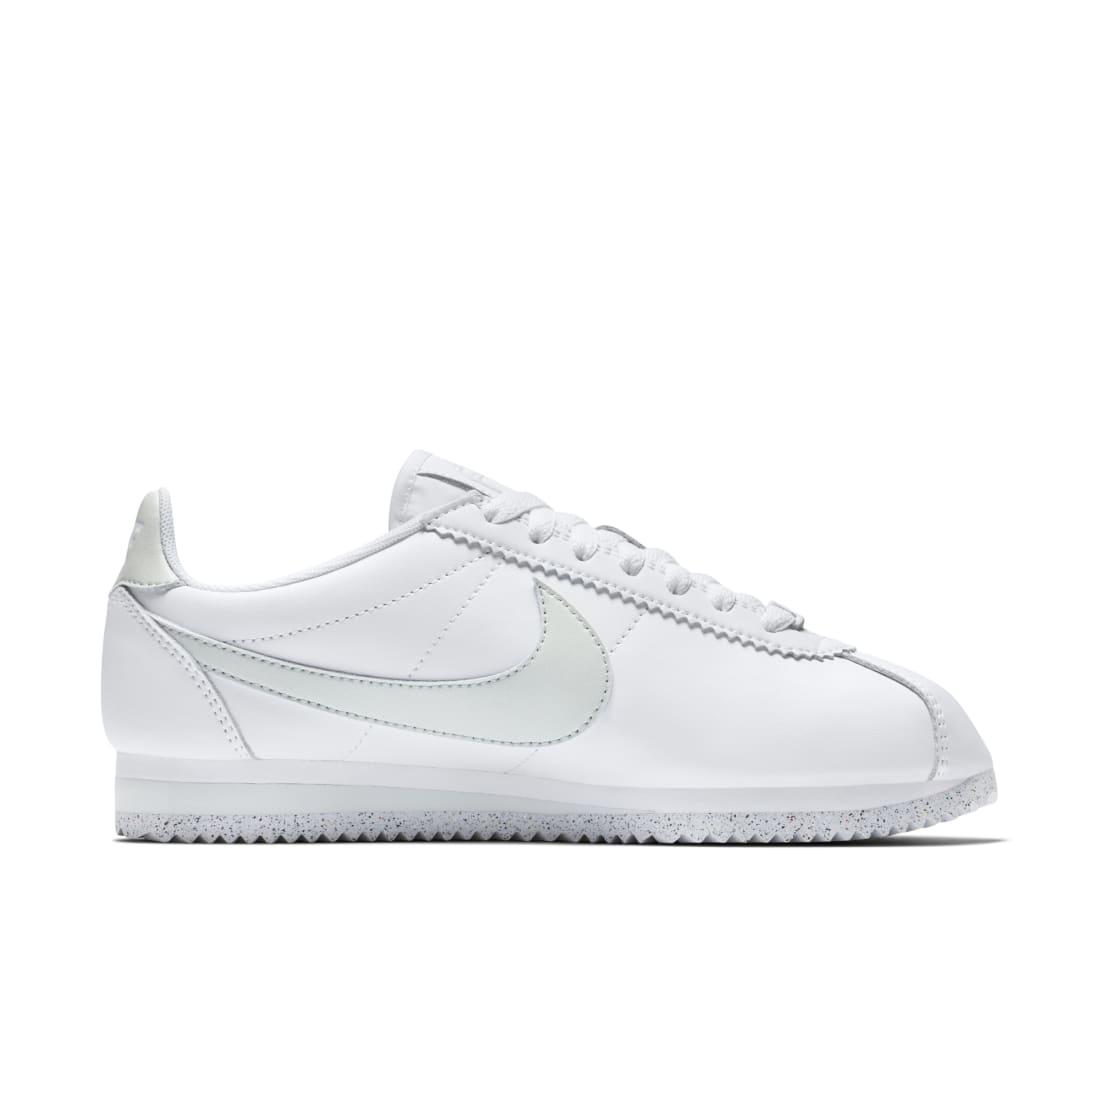 Nike Cortez White Light Silver | Nike